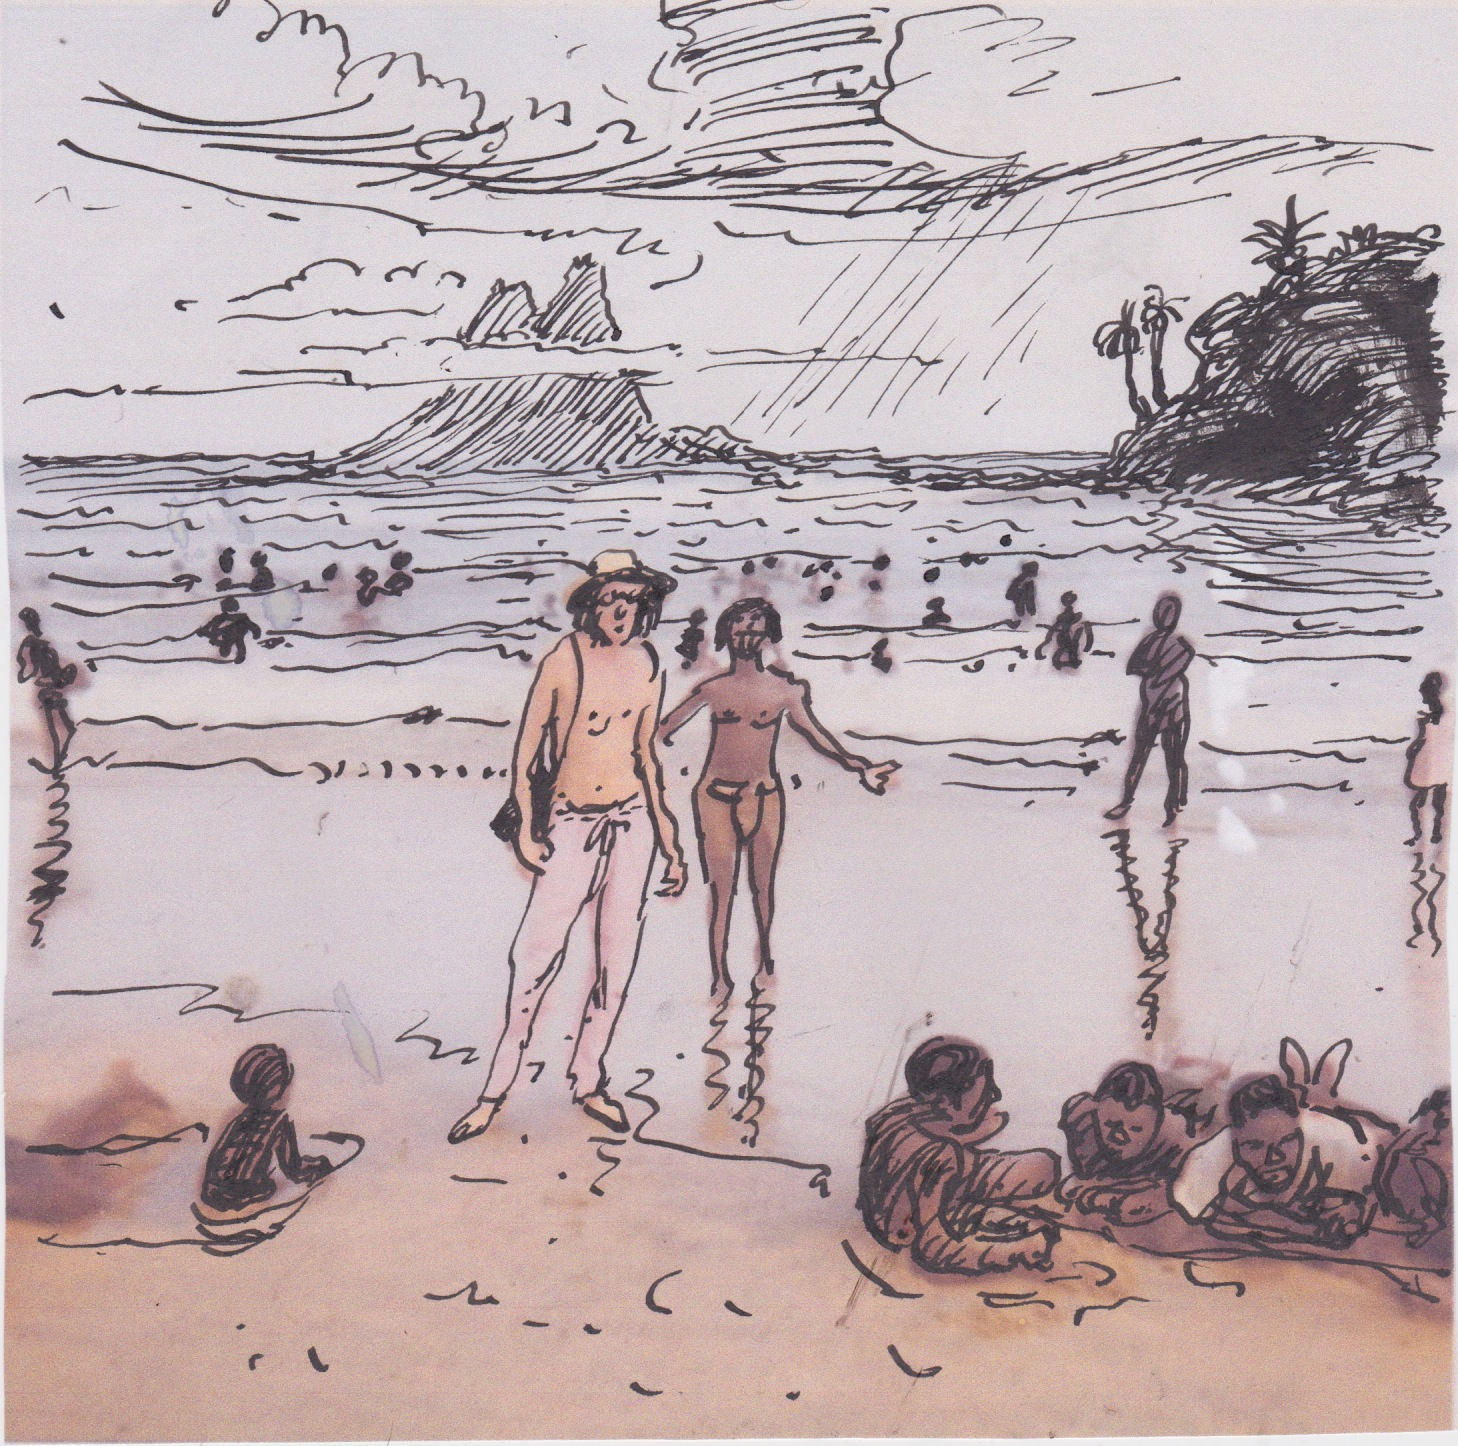 Tlula Leisure Beach (Peter Kingston)